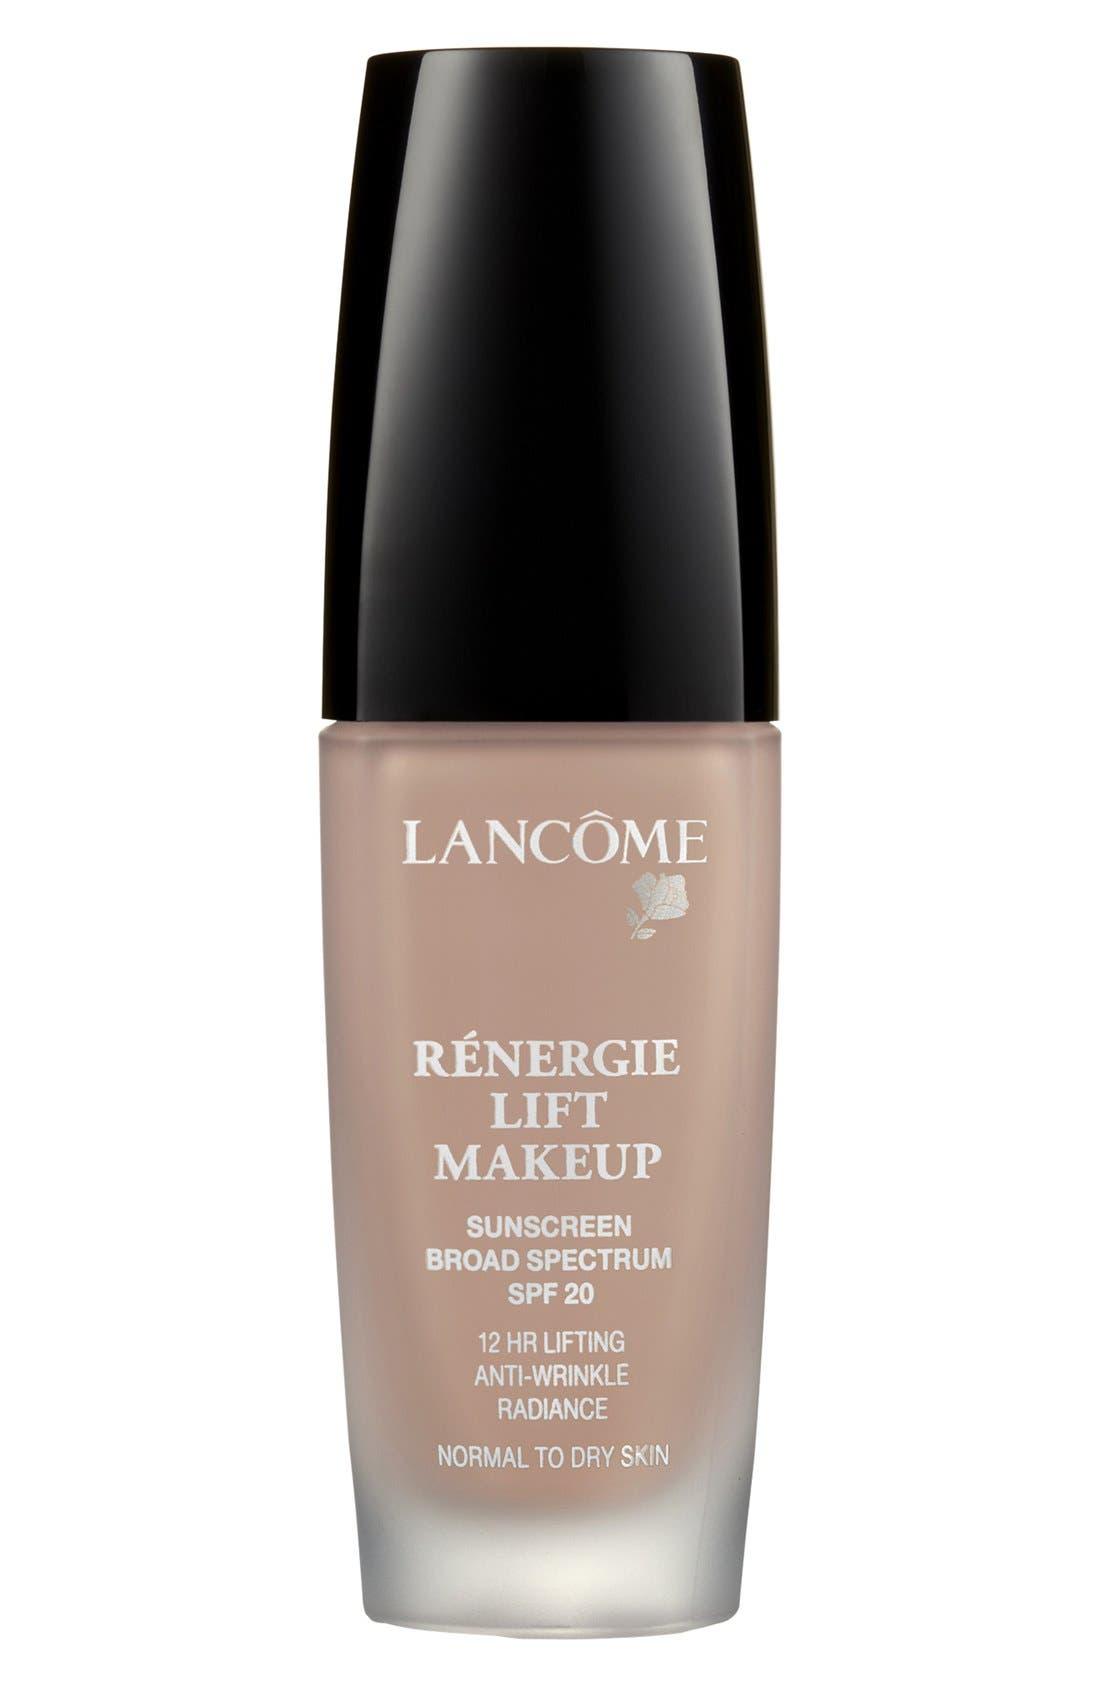 Lancôme Rénergie Lift Makeup SPF 20